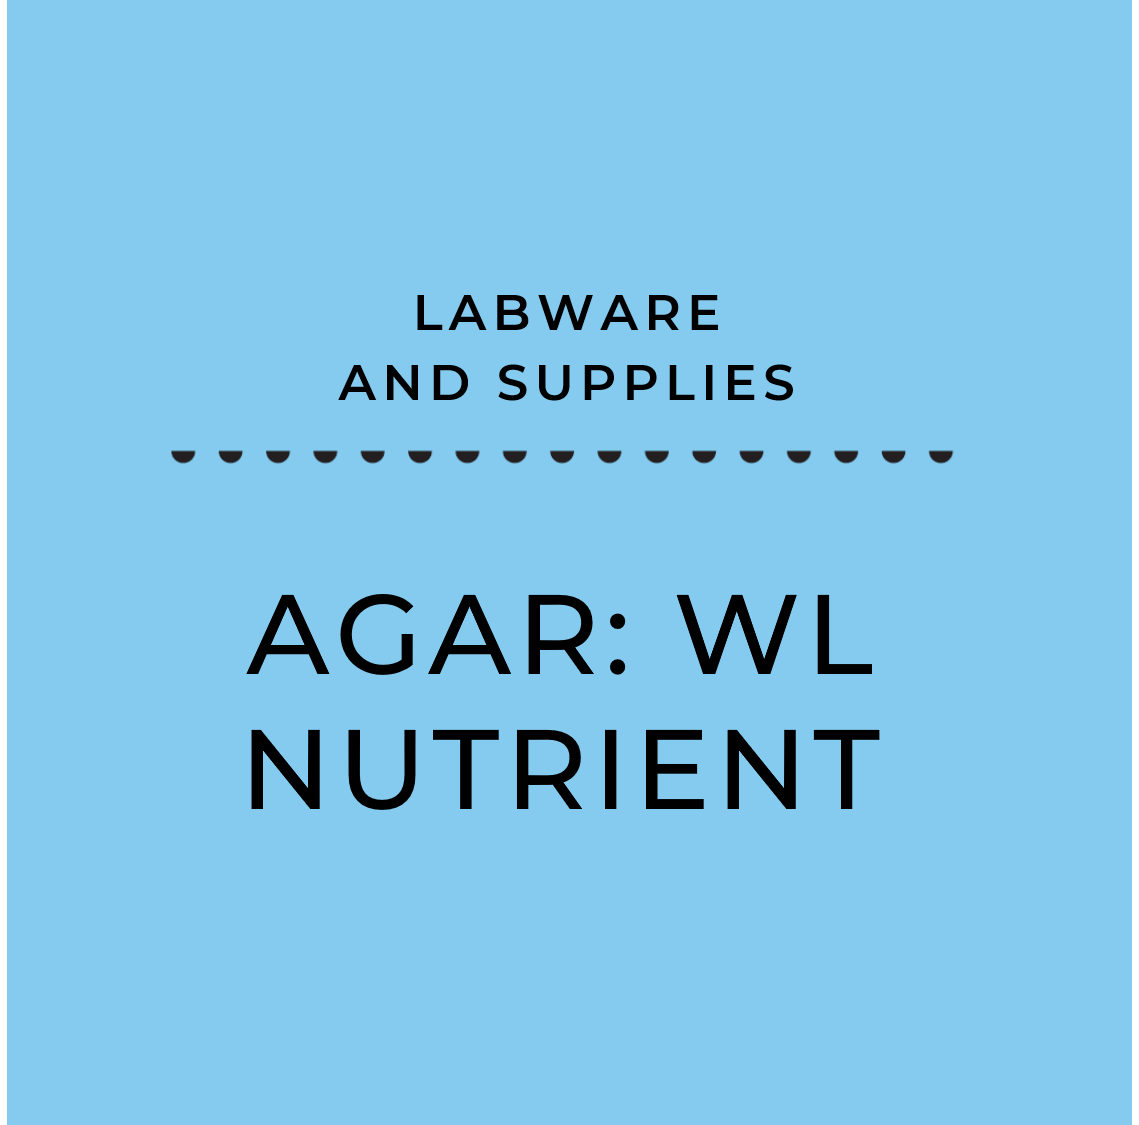 Agar: WL Nutrient